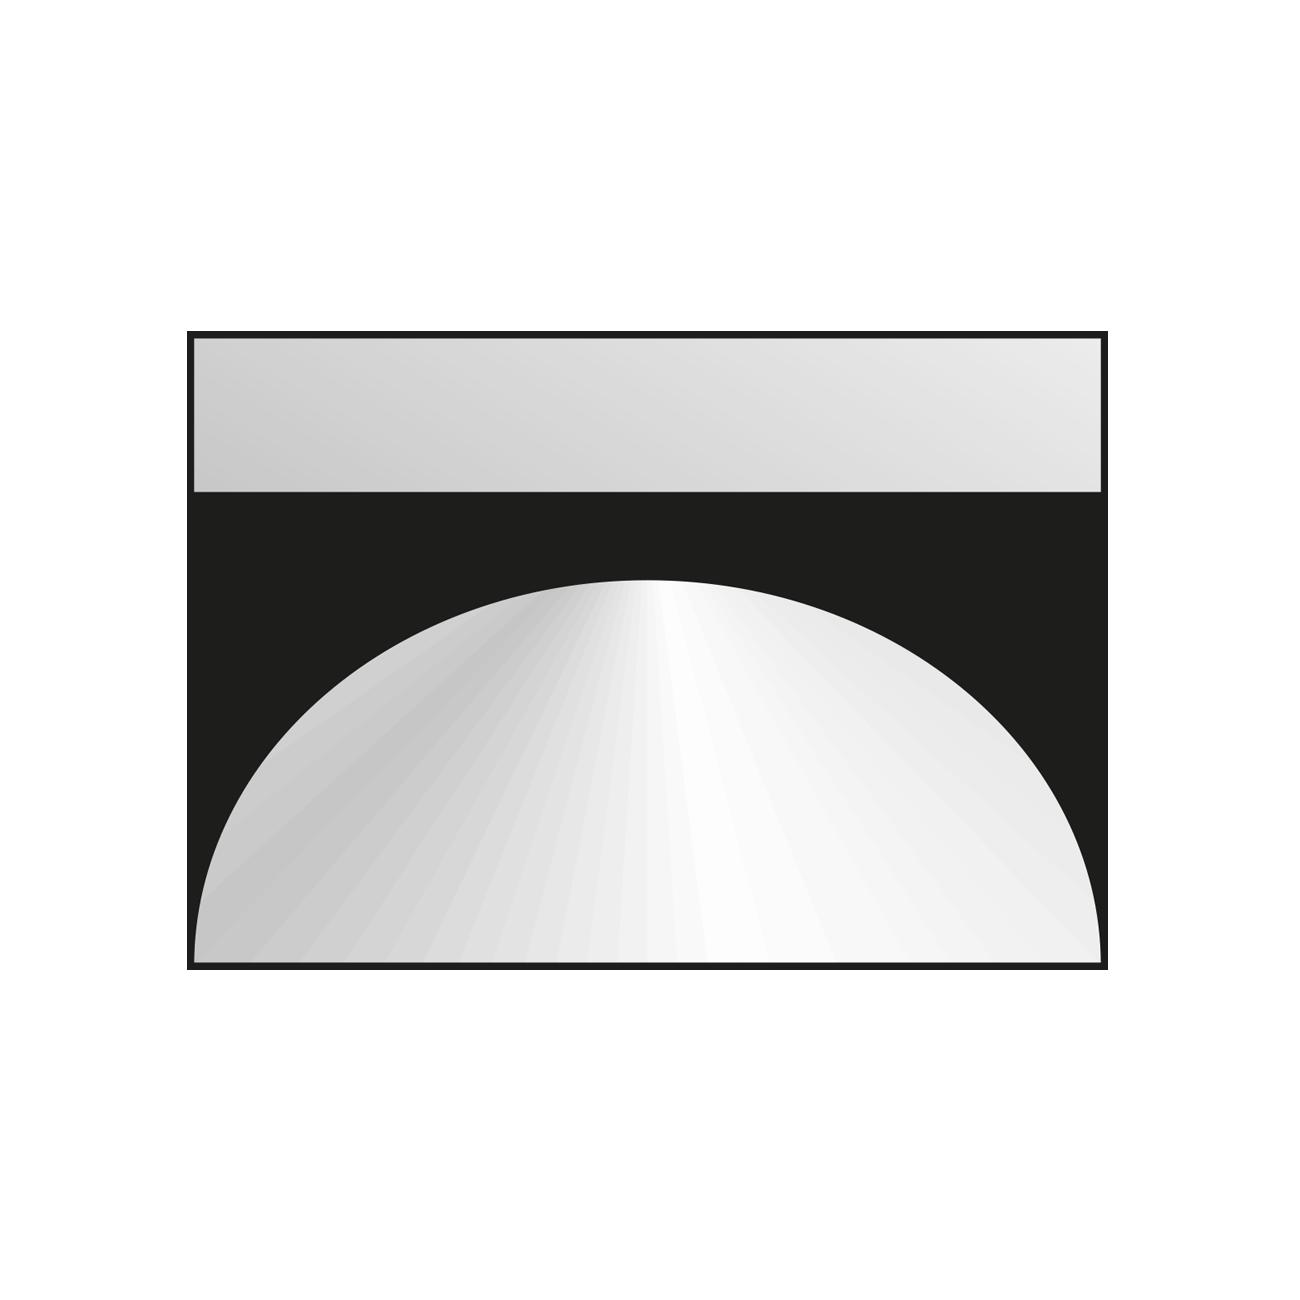 Pana Circulara 6888 Otel Olc45-4x 5.0-13